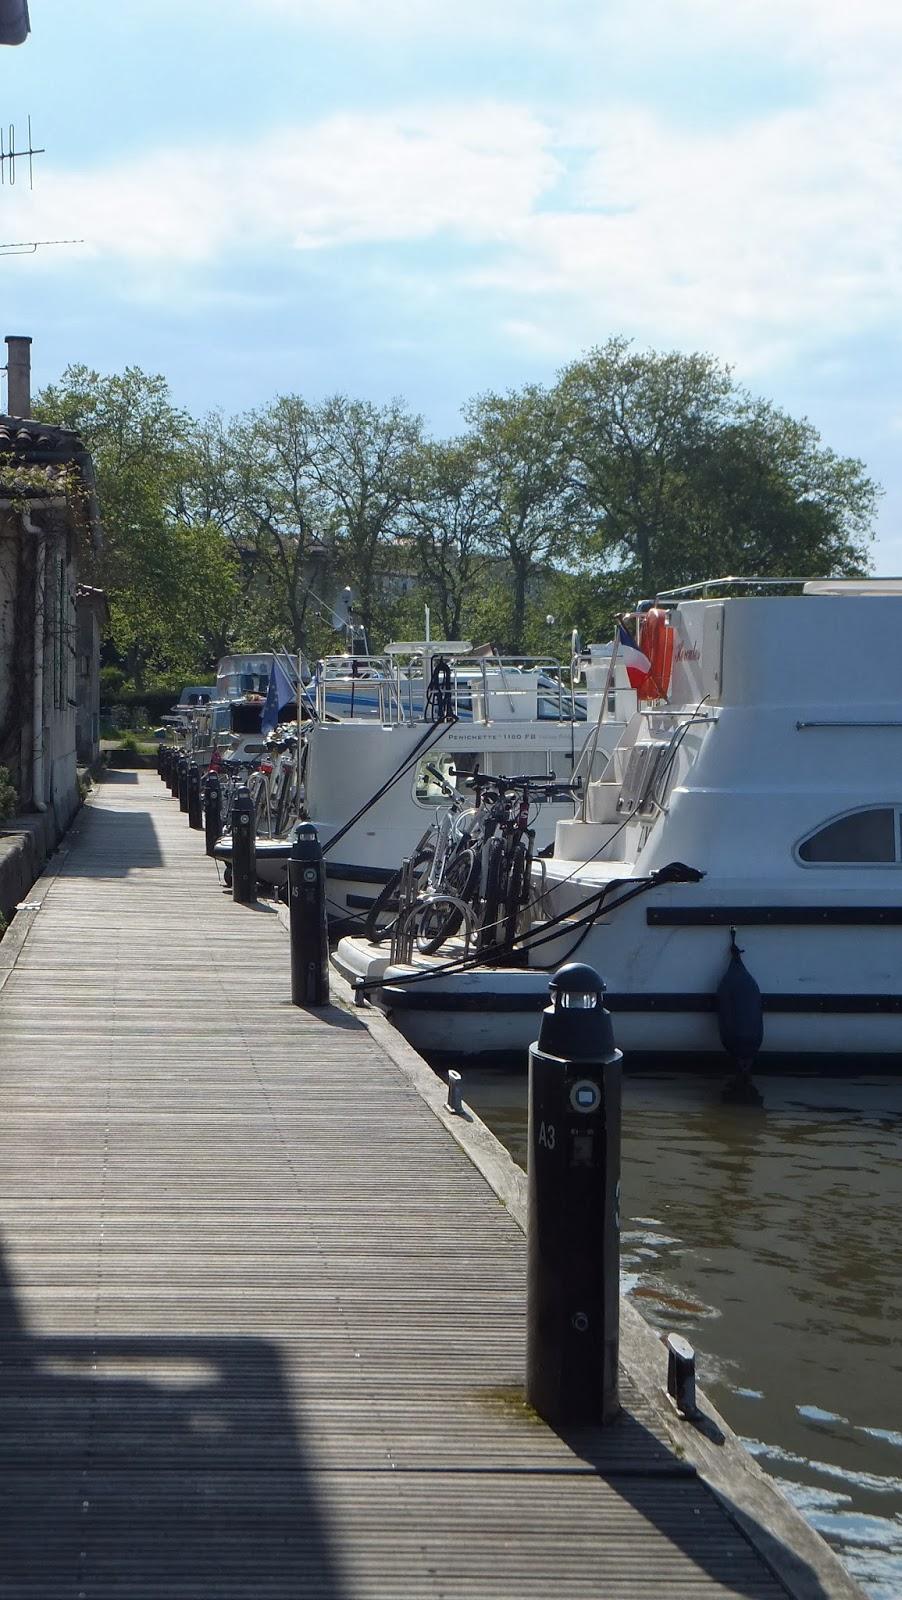 Canal du Midi, Canal del Mediodía, Carcassonne, Carcasona, Francia, Elisa N, Blog de Viajes, Lifestyle, Travel